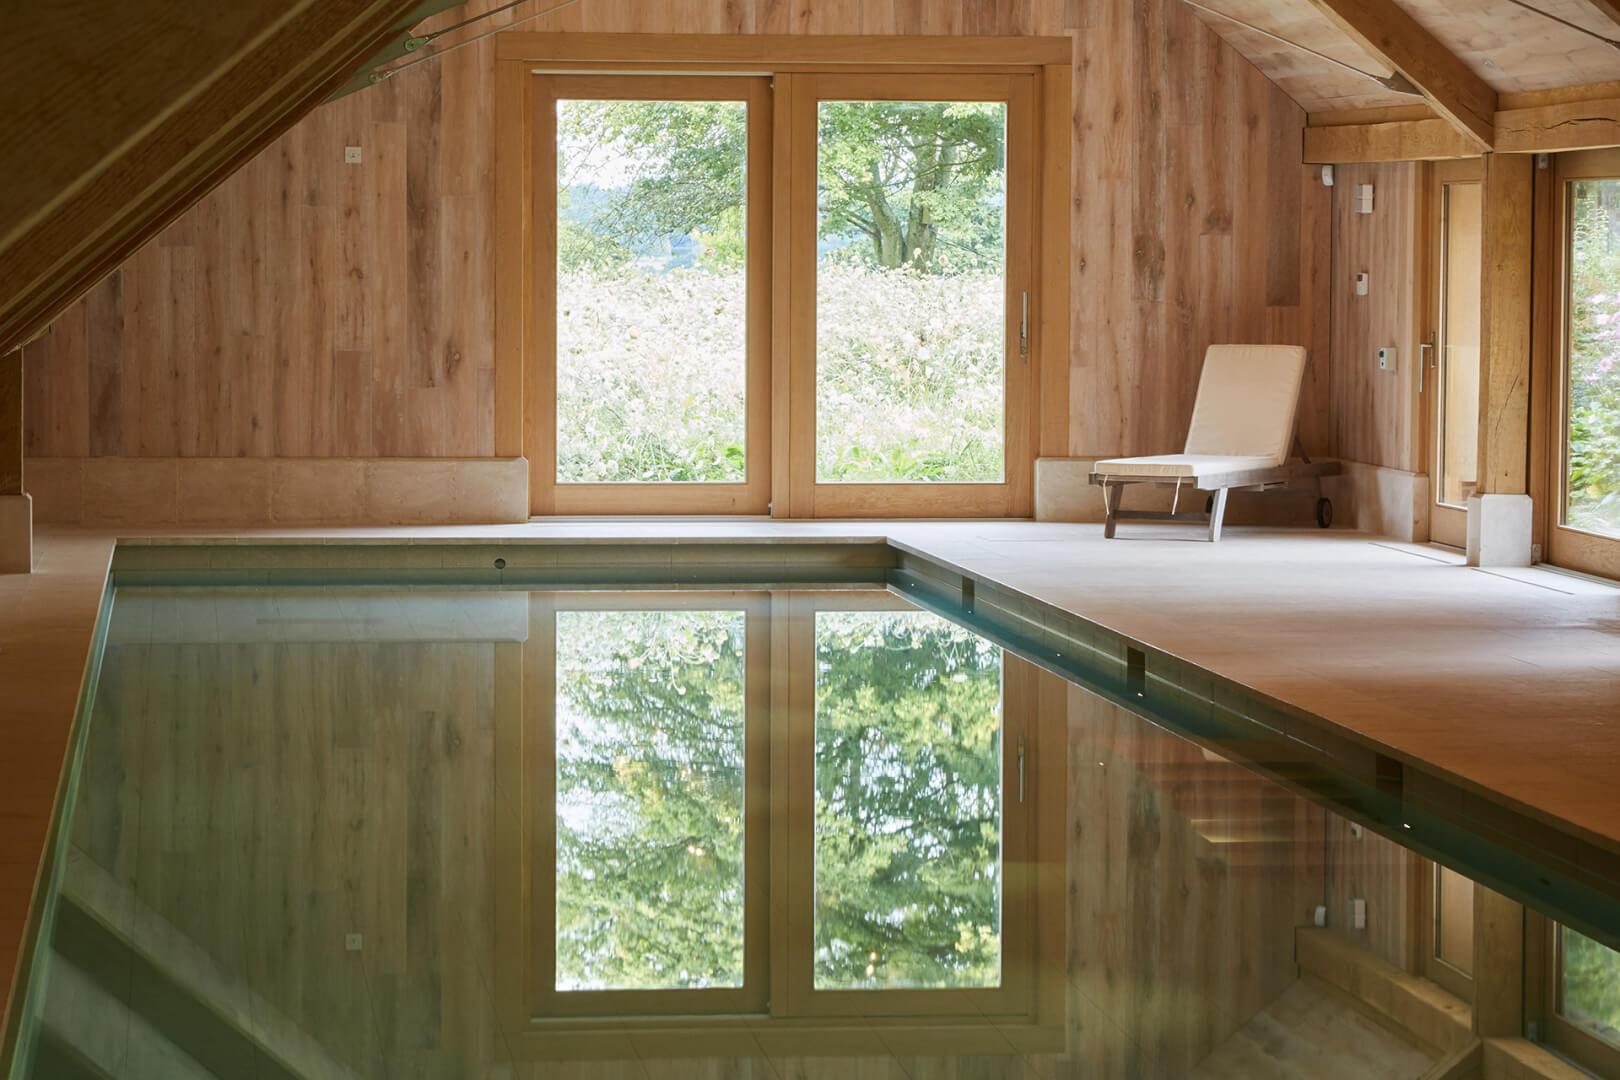 Indoor swimming pool by Guncast